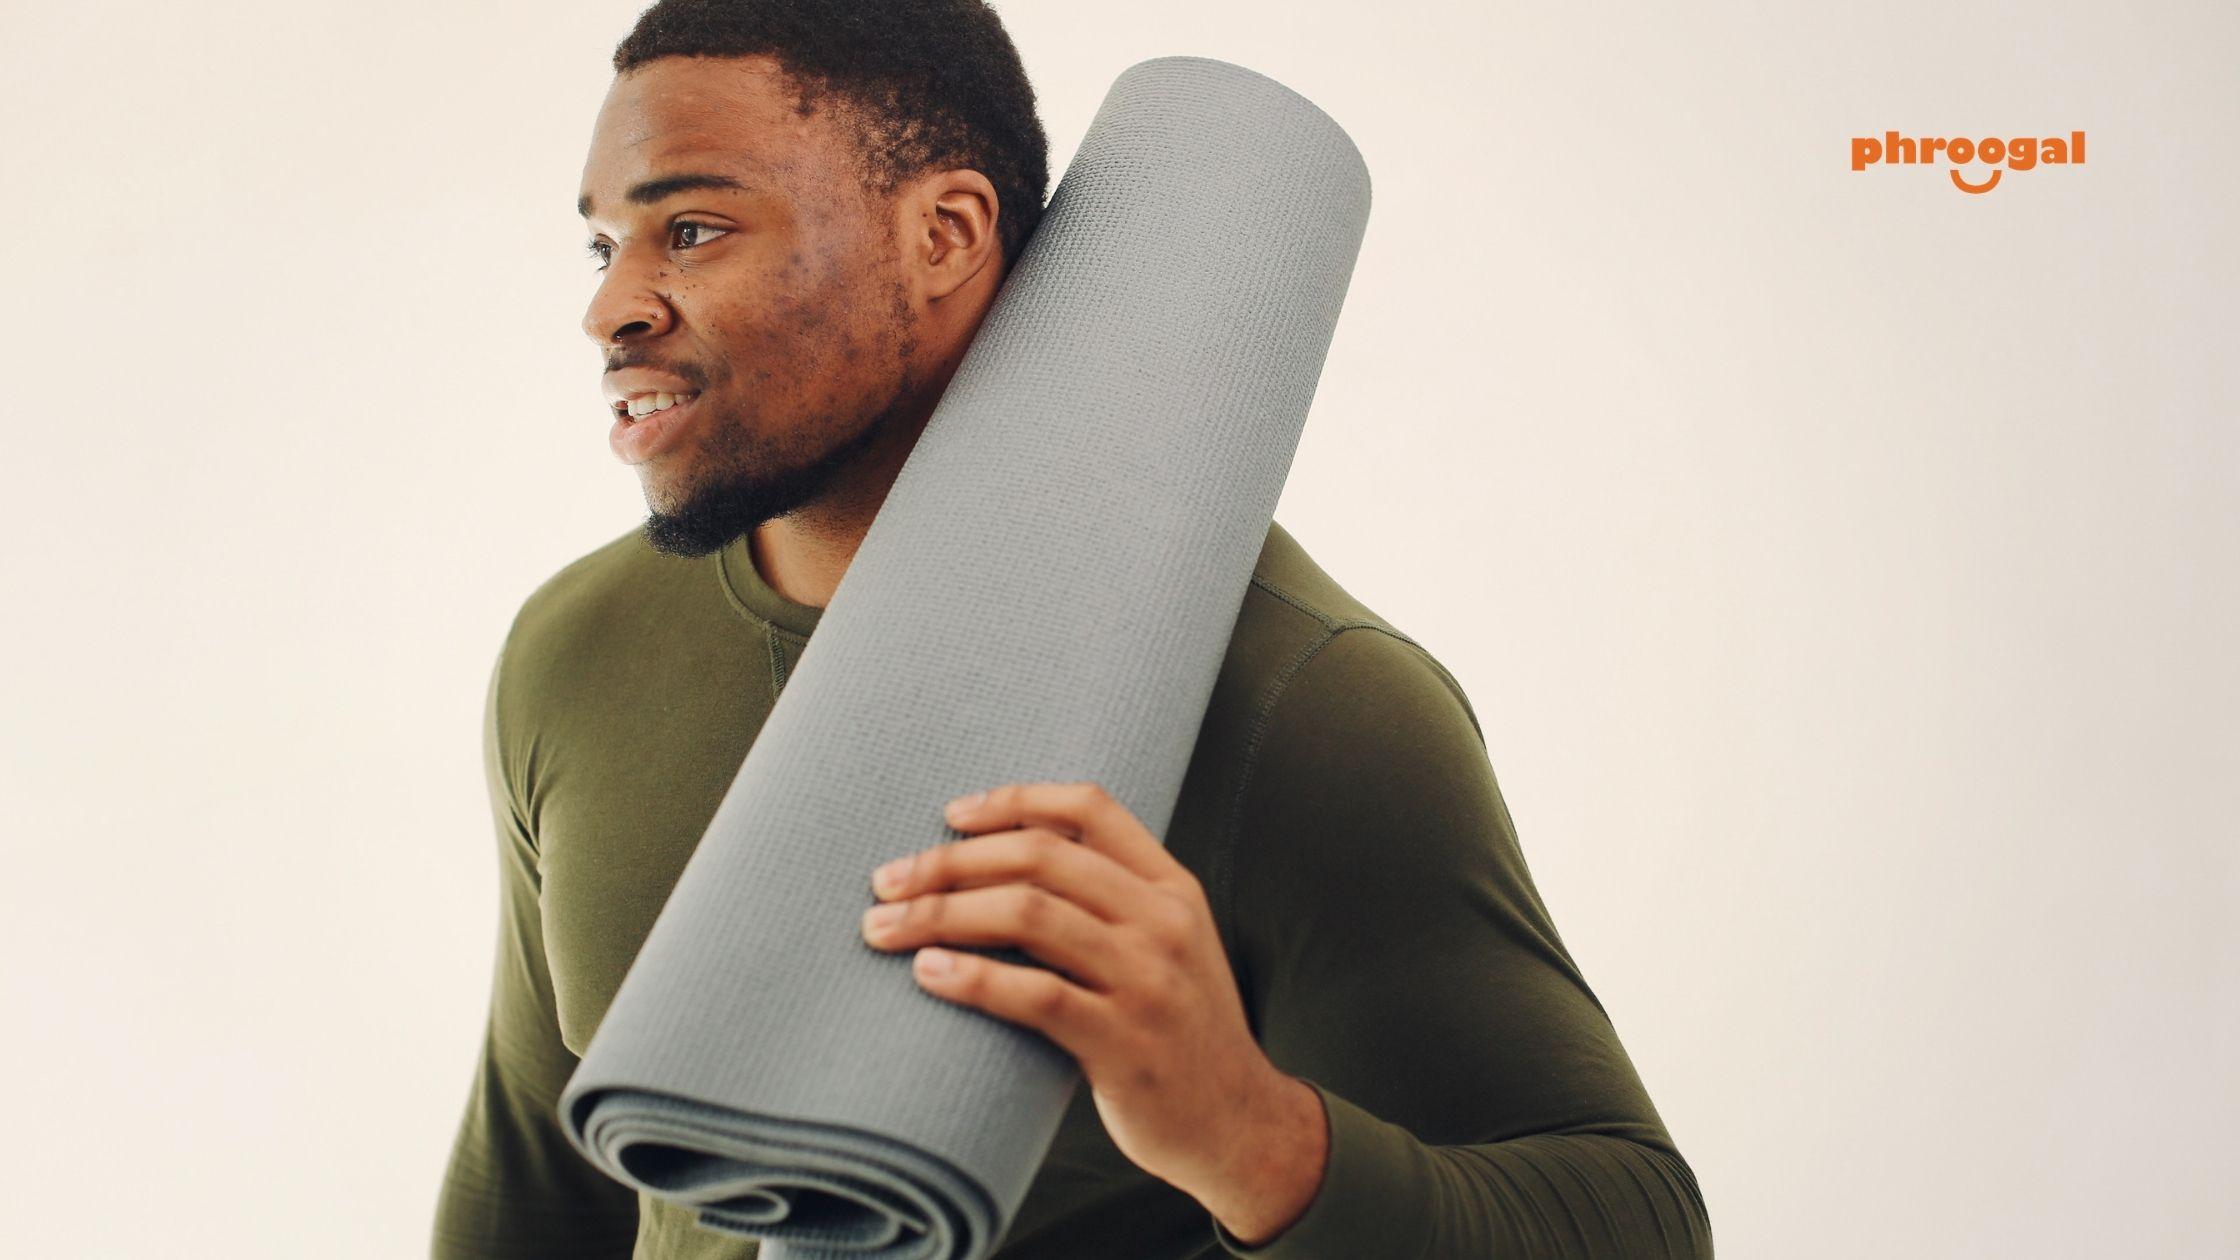 Yoga Improves Your Finances phroogal